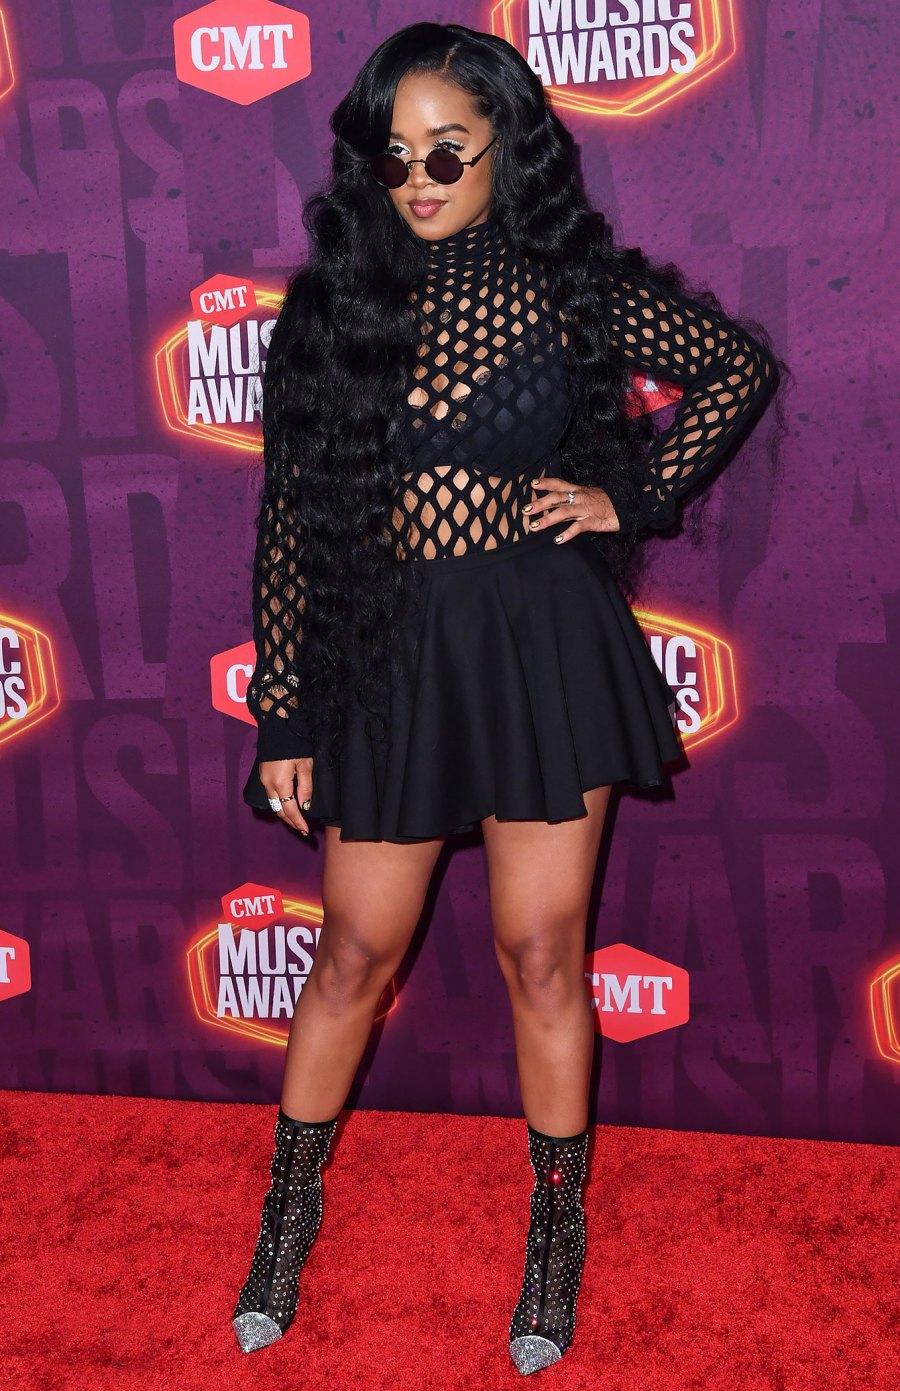 CMT Music Awards 2021 Red Carpet Arrivals - H.E.R.